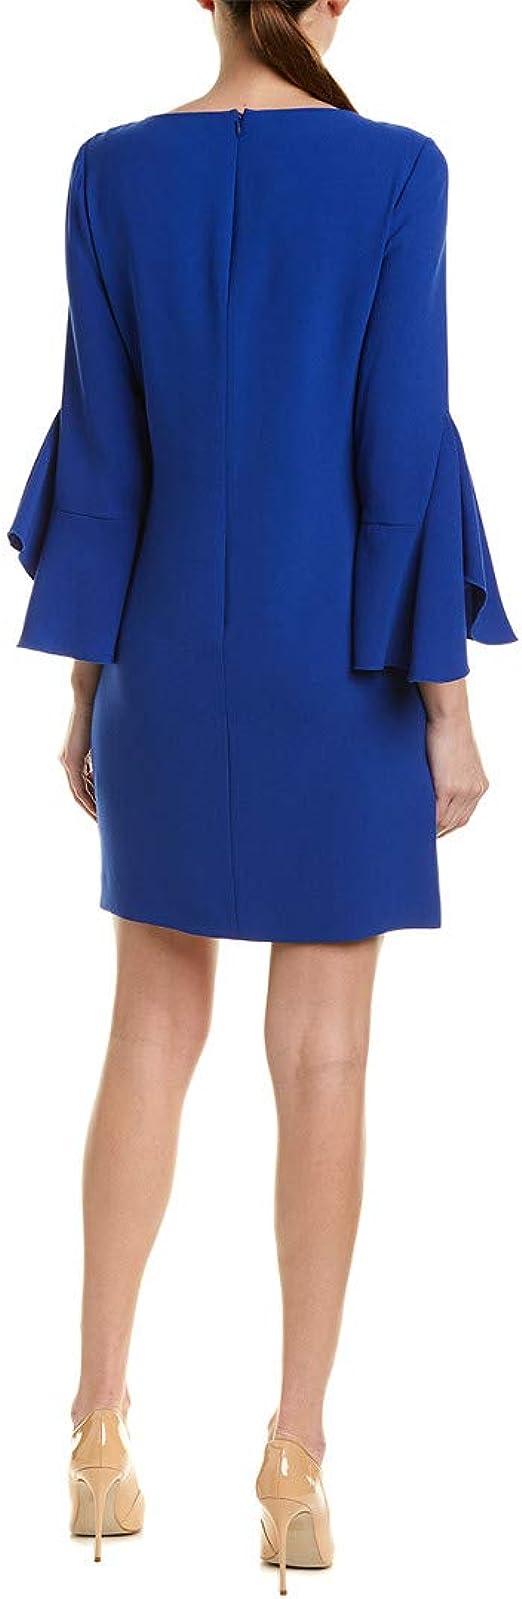 Elie Tahari Womens Dori Blue Bell Sleeves Mini Sheath Cocktail Dress 8 BHFO 7861